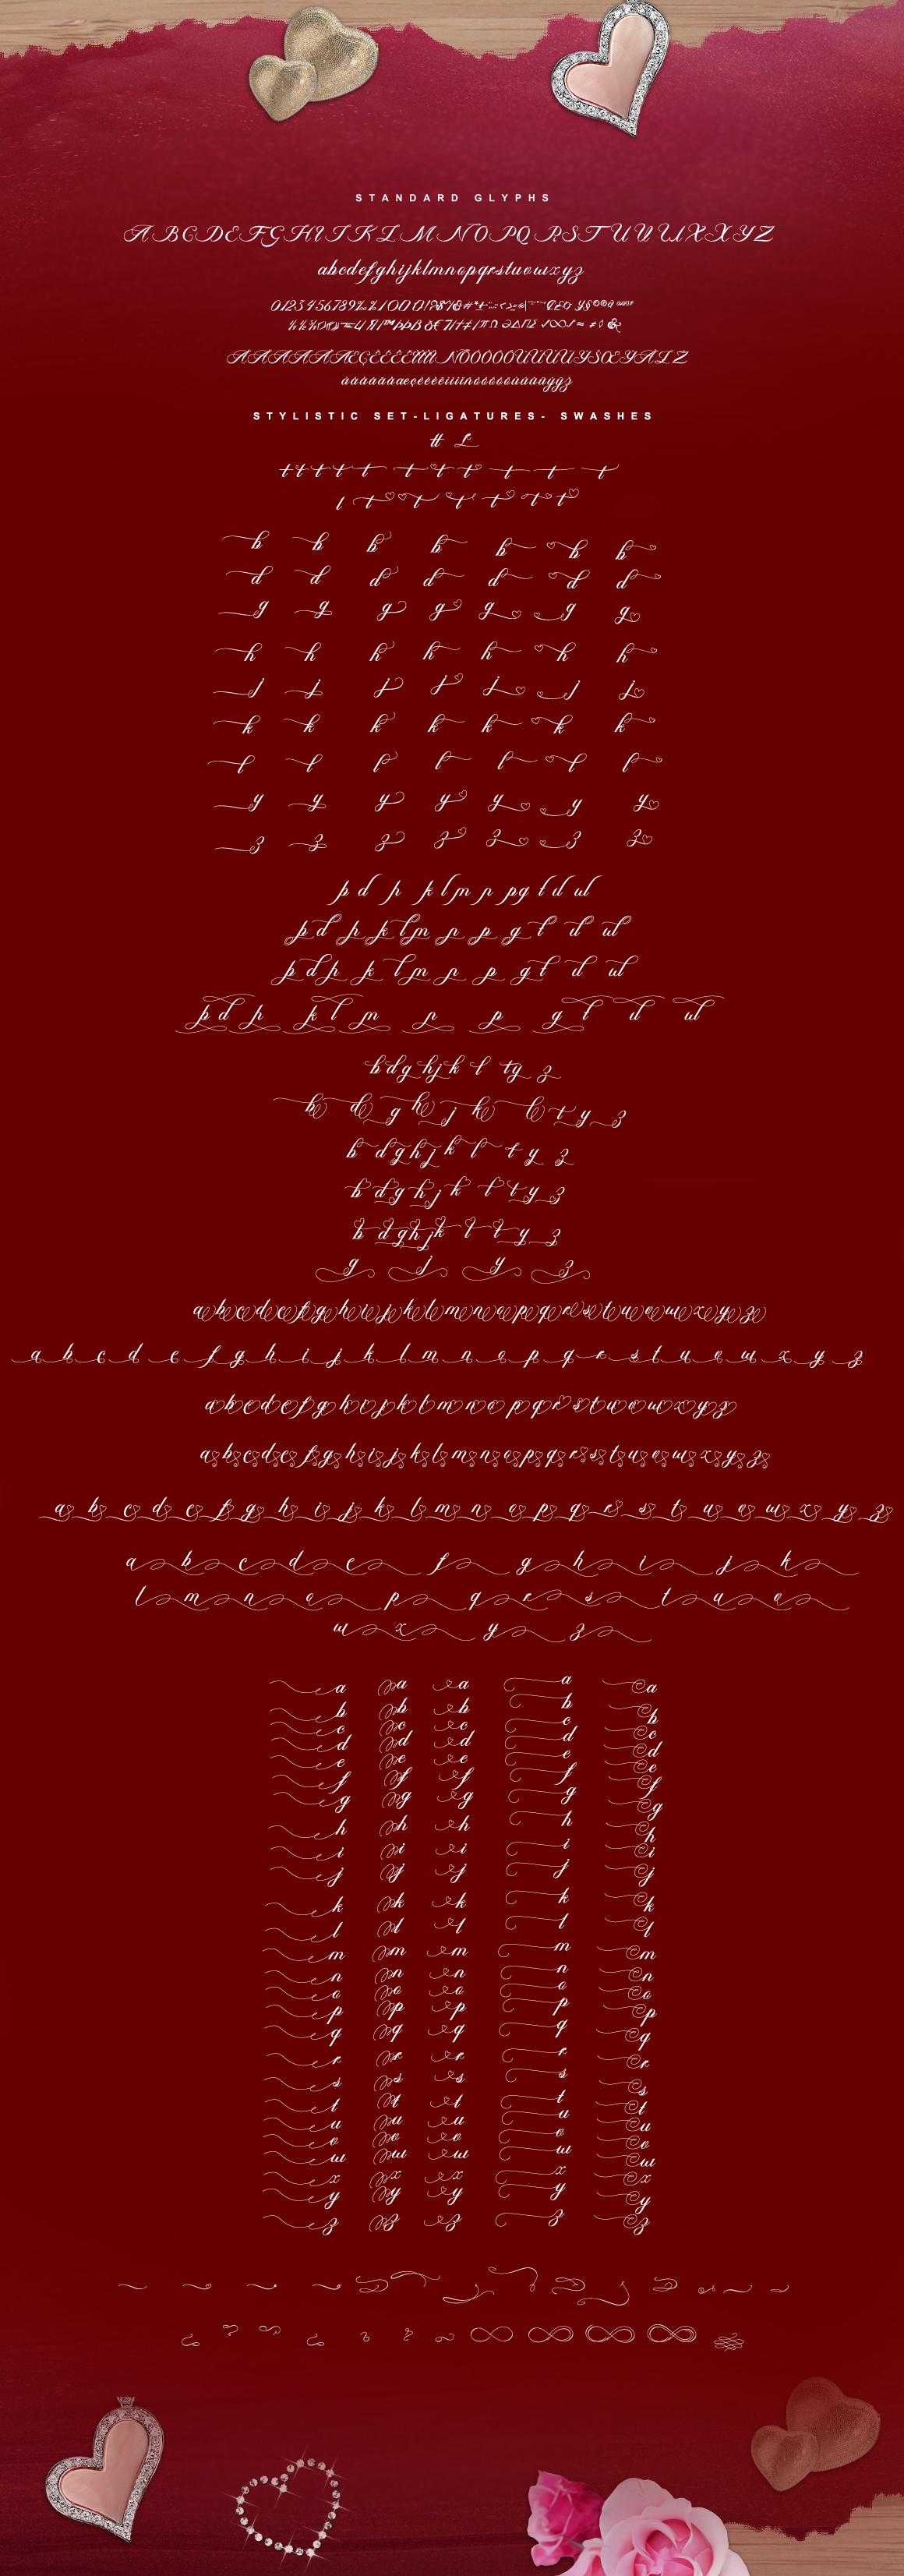 Ambergris example image 5